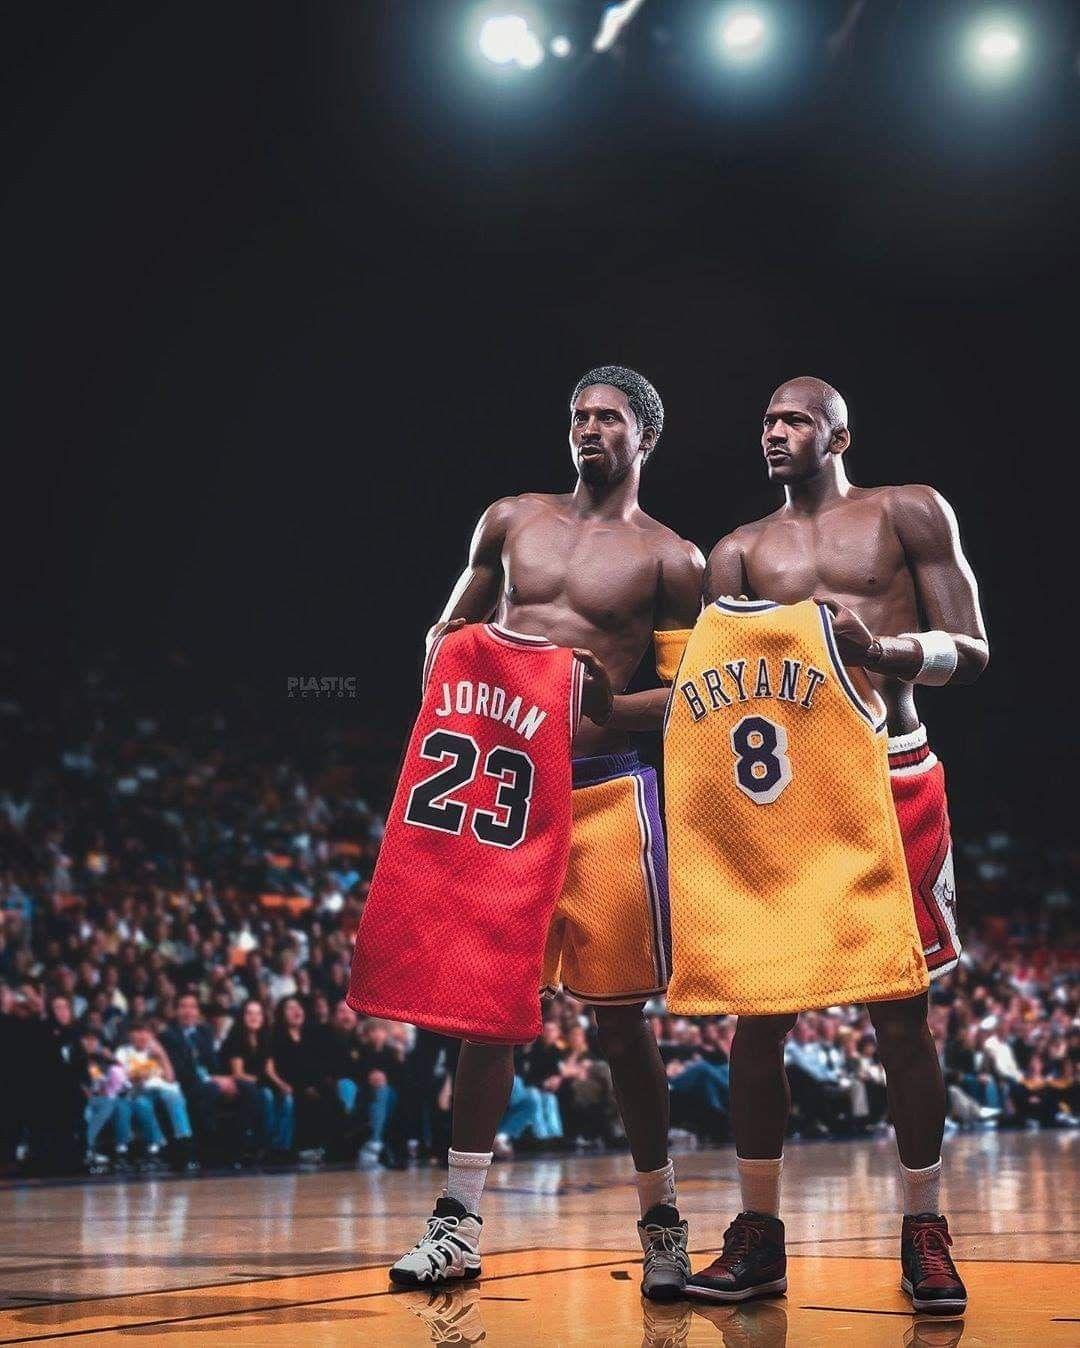 Pin By Austin Youth Basketball On Cool Basketball Shirts In 2020 Kobe Bryant Michael Jordan Kobe Bryant Pictures Kobe Bryant